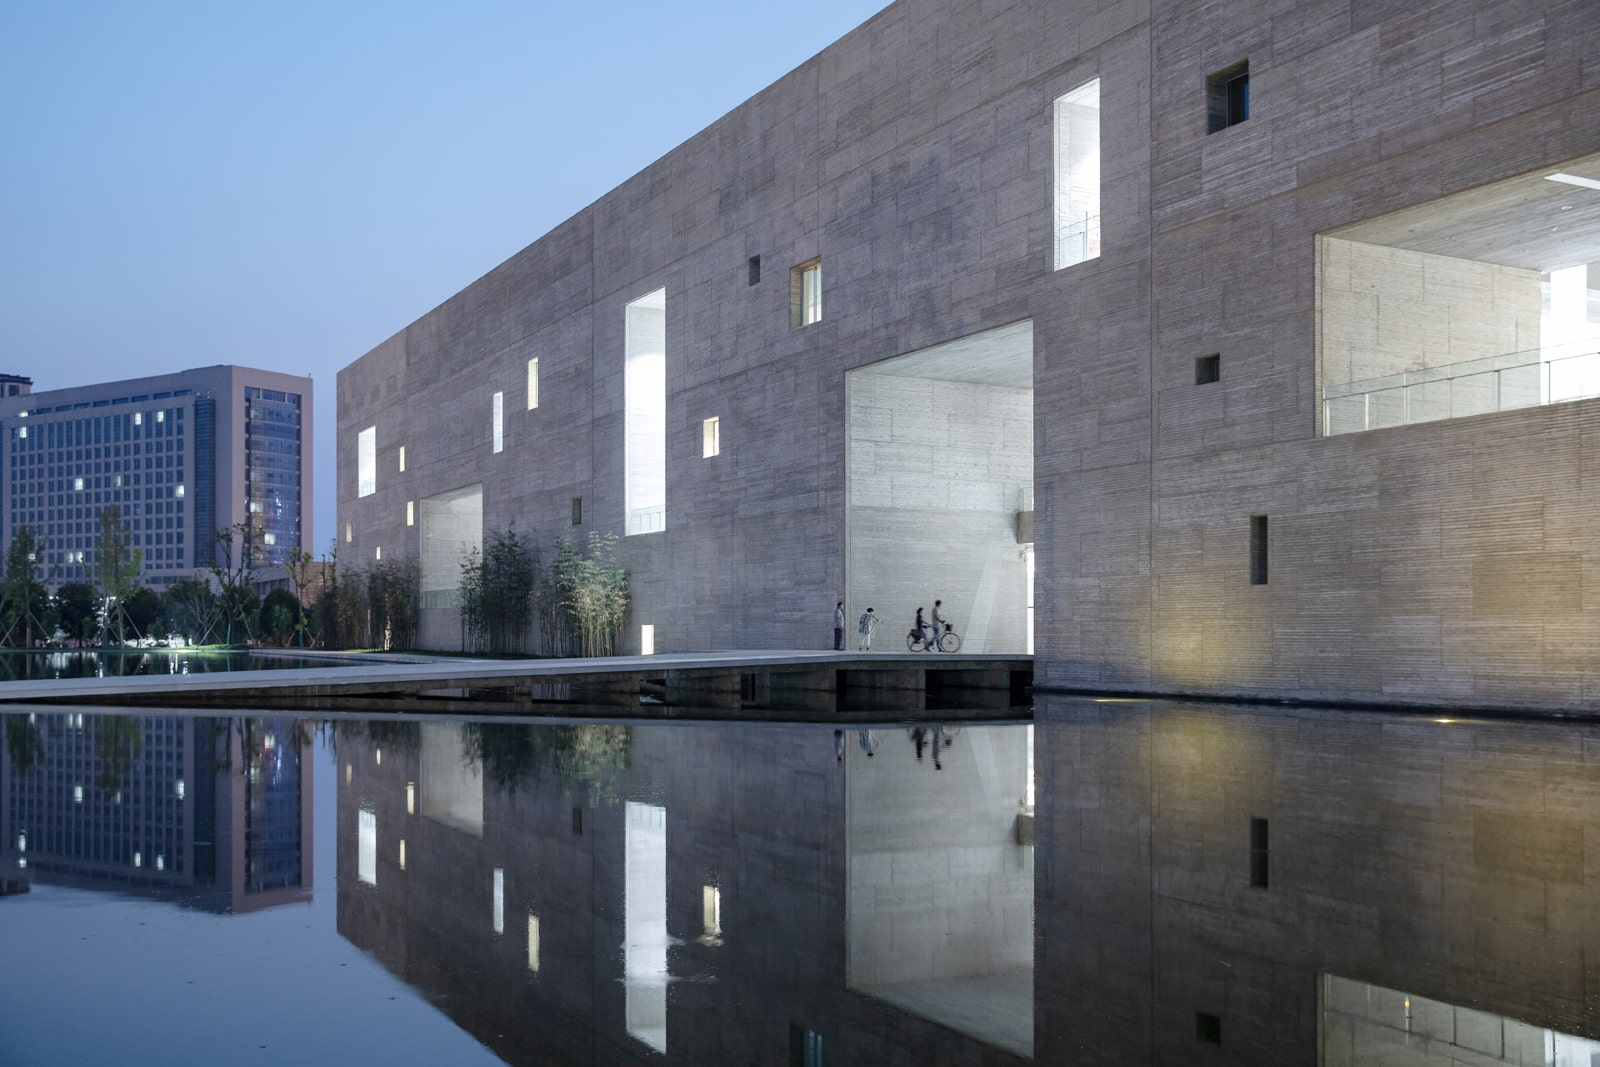 Shou County Culture and Art Center  - 20210702 Zhu Pei ShouCountyCultureArtCenter 02 33